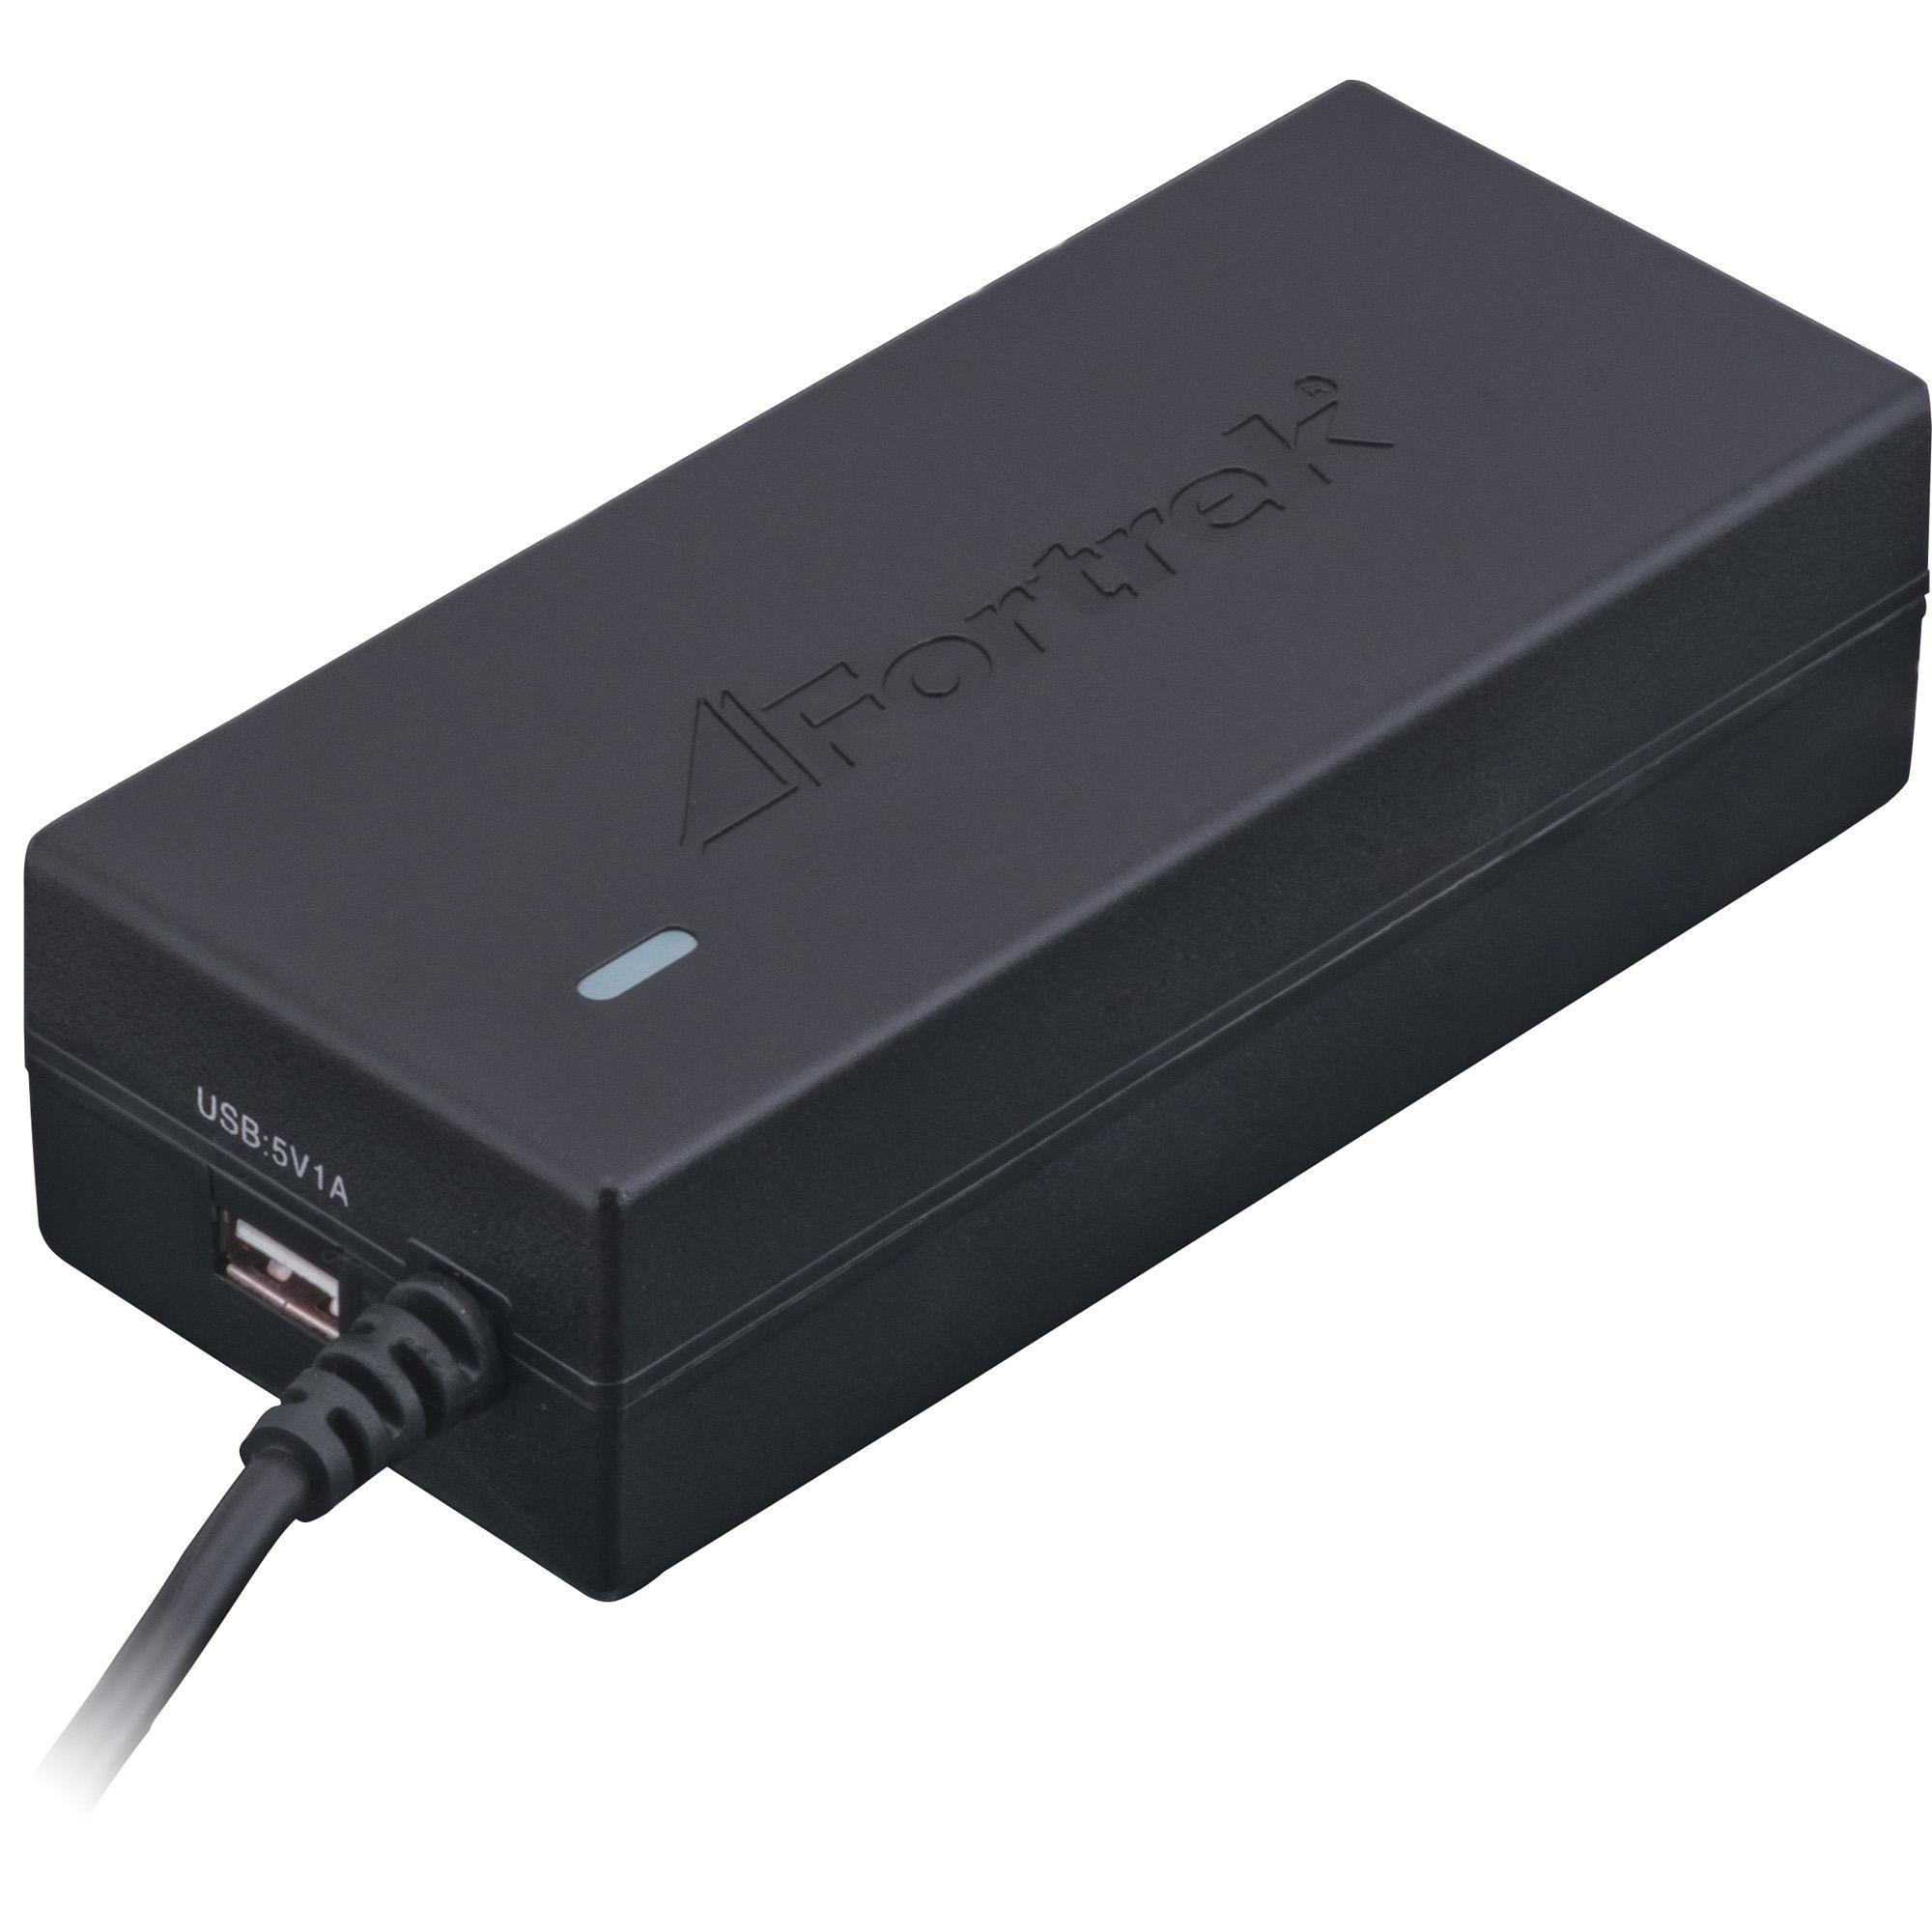 Fonte para Notebook Universal 90W com 10 Pinos Bivolt porta USB 5V 52369 - Fortrek